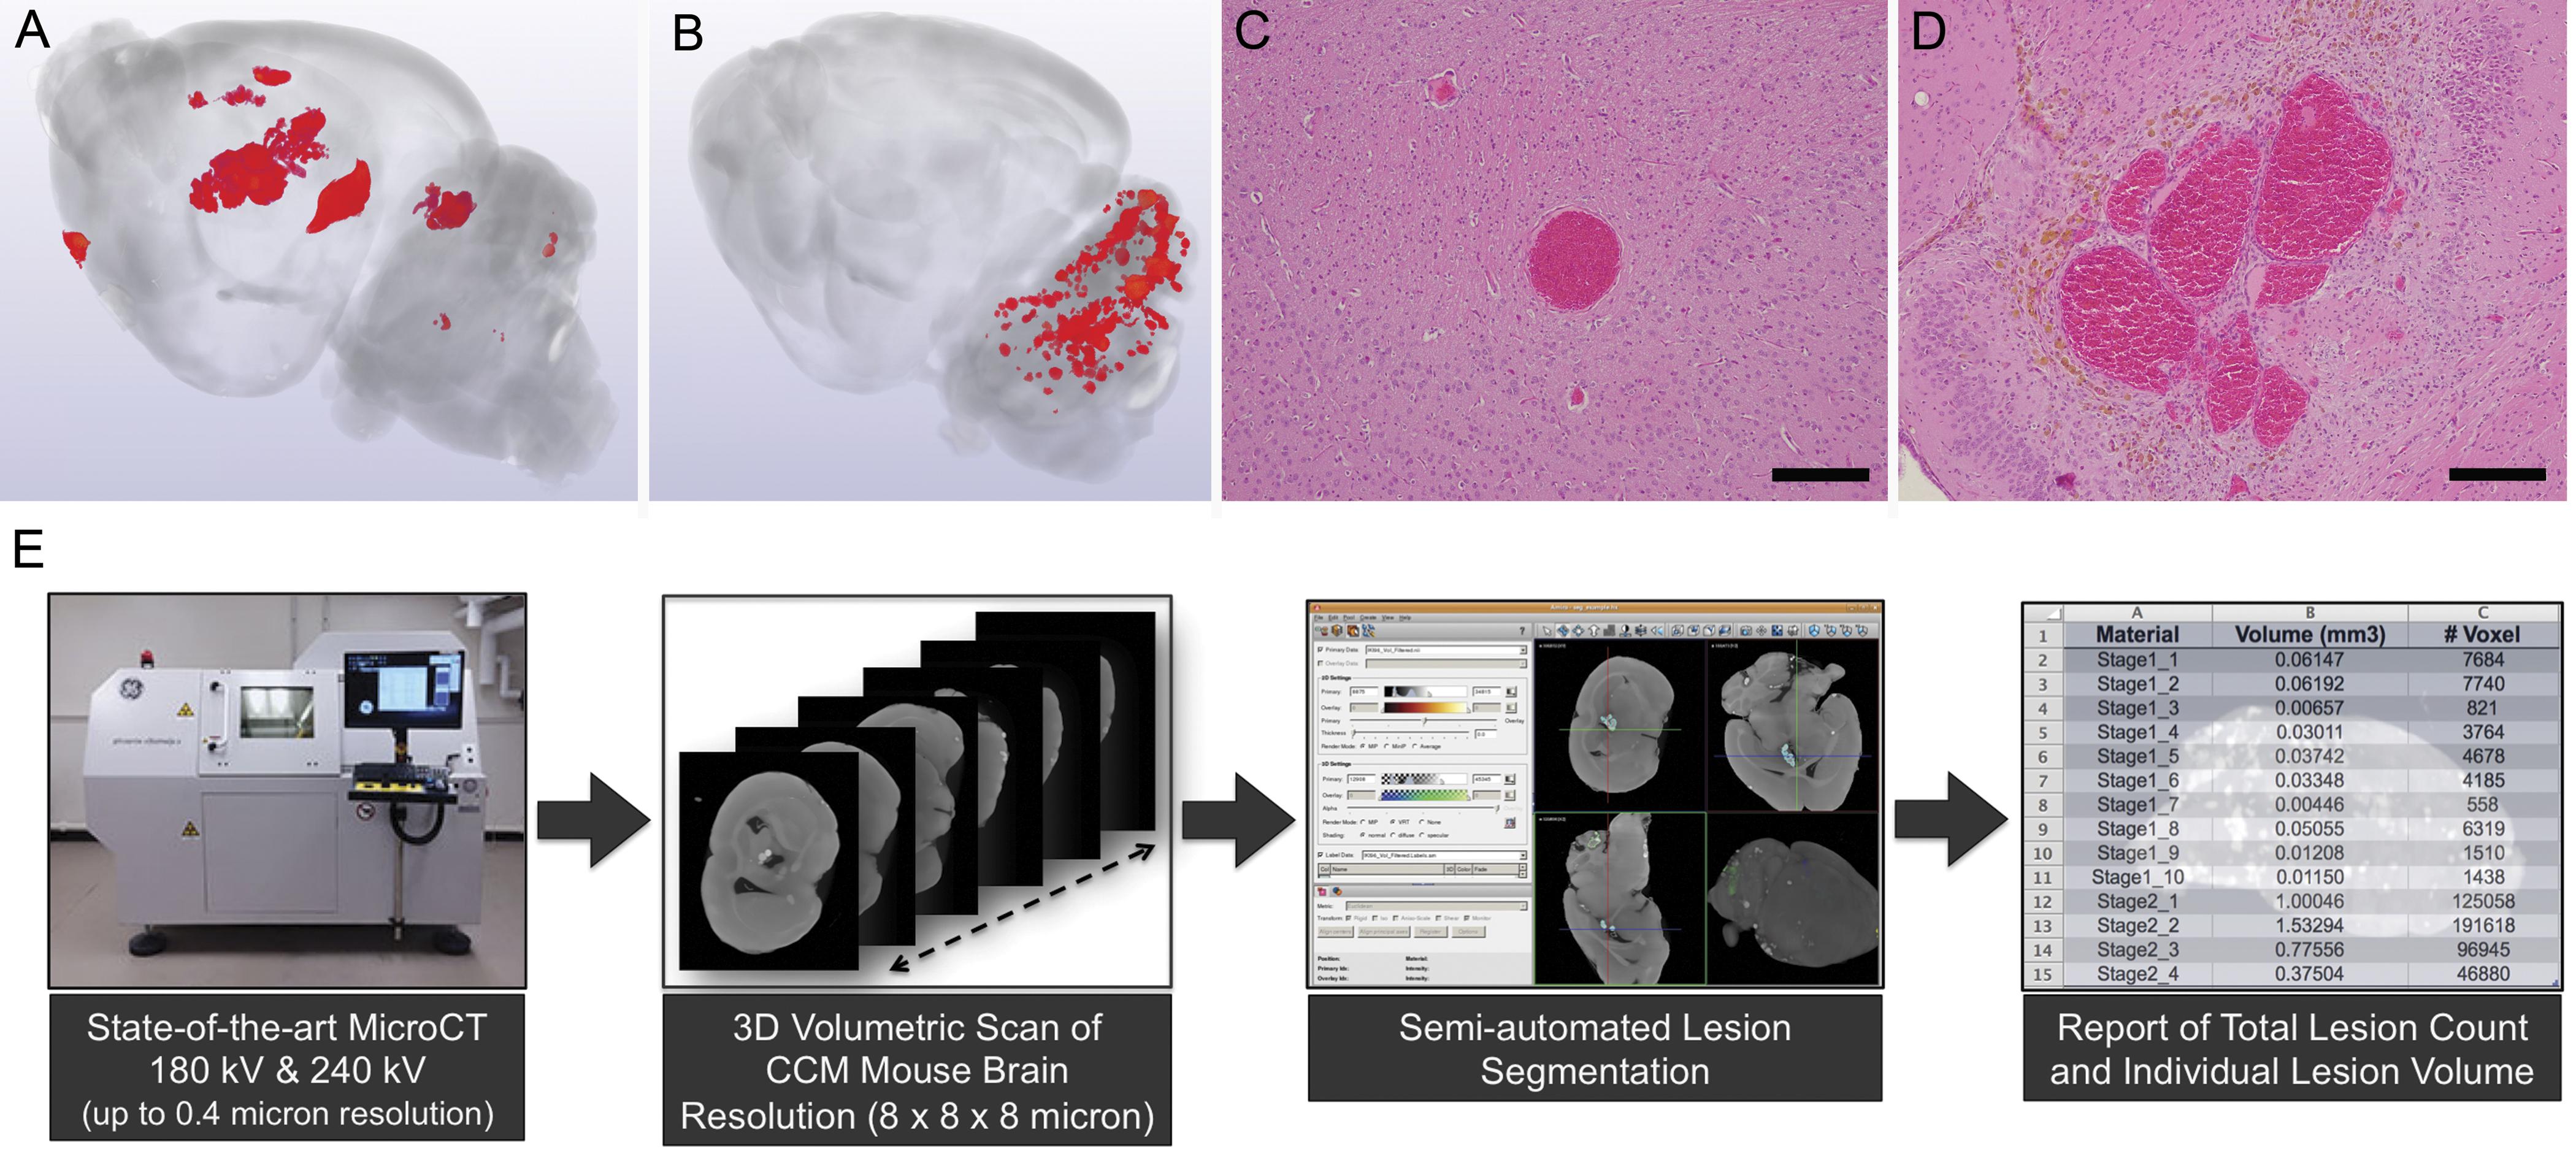 Cavernous angiomas: deconstructing a neurosurgical disease